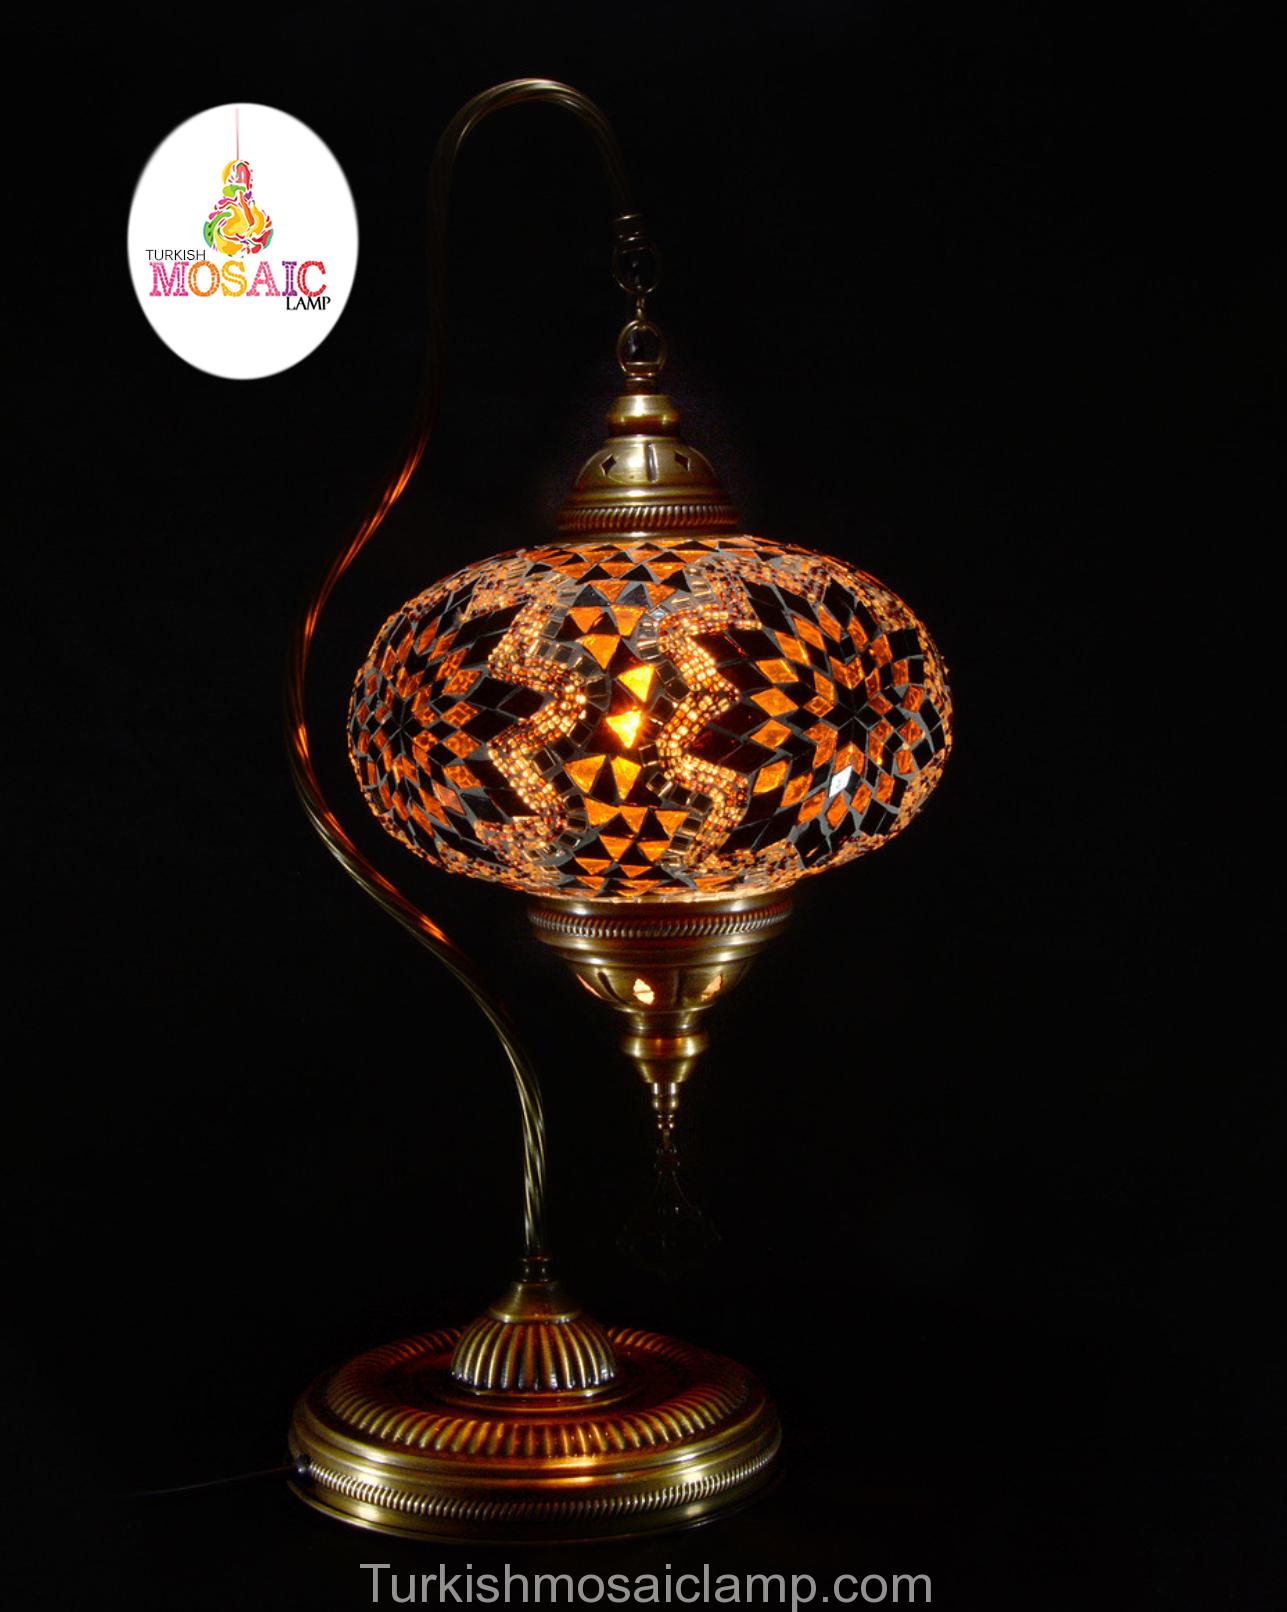 swan-mosaic-lamp-size-5